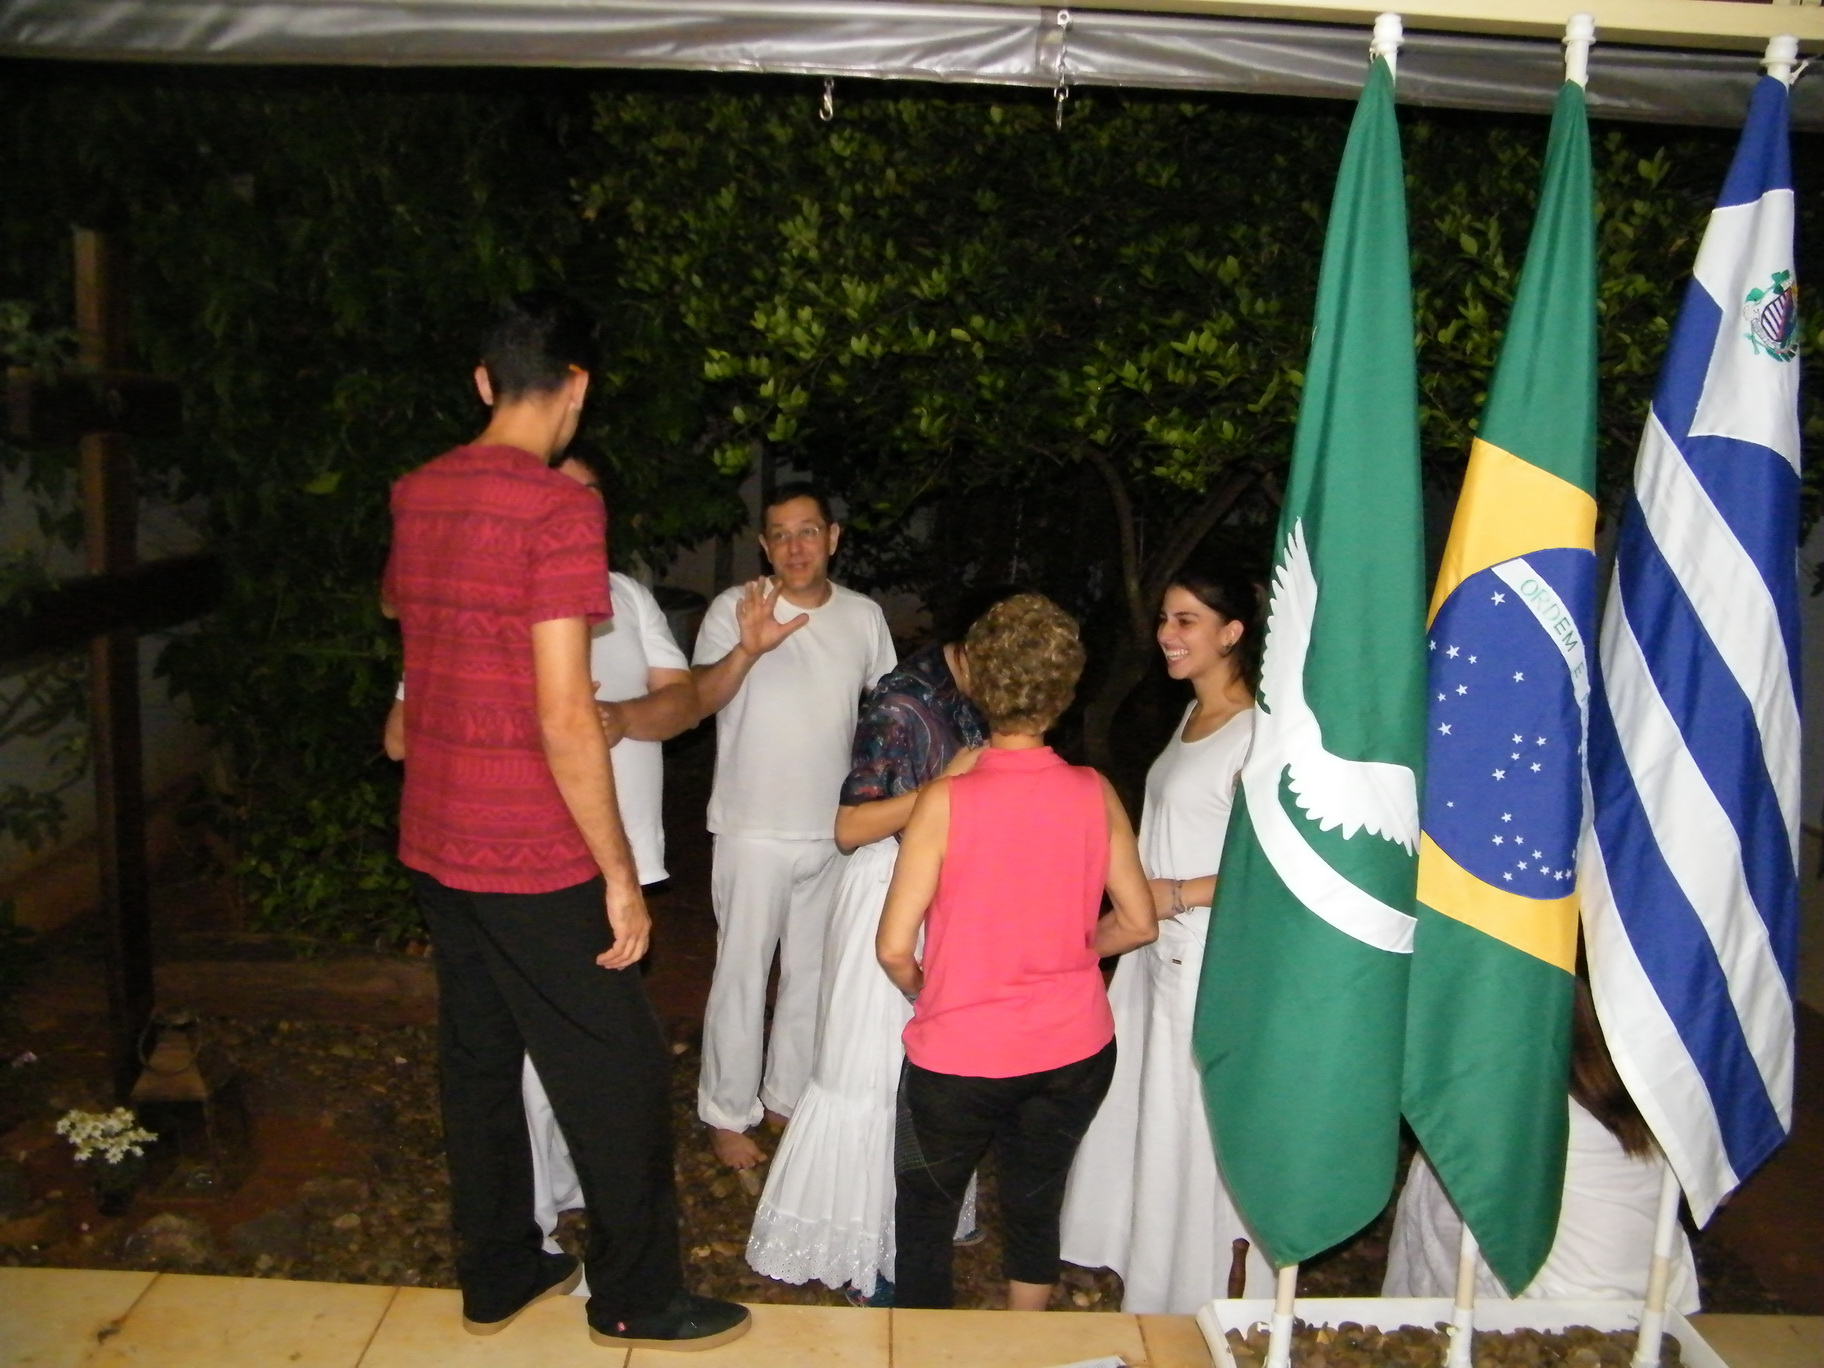 Confraternização_Hinário_Sois_Baliza_-_Germano_Guilherme_-_25-07-2015_DSCF0006.J